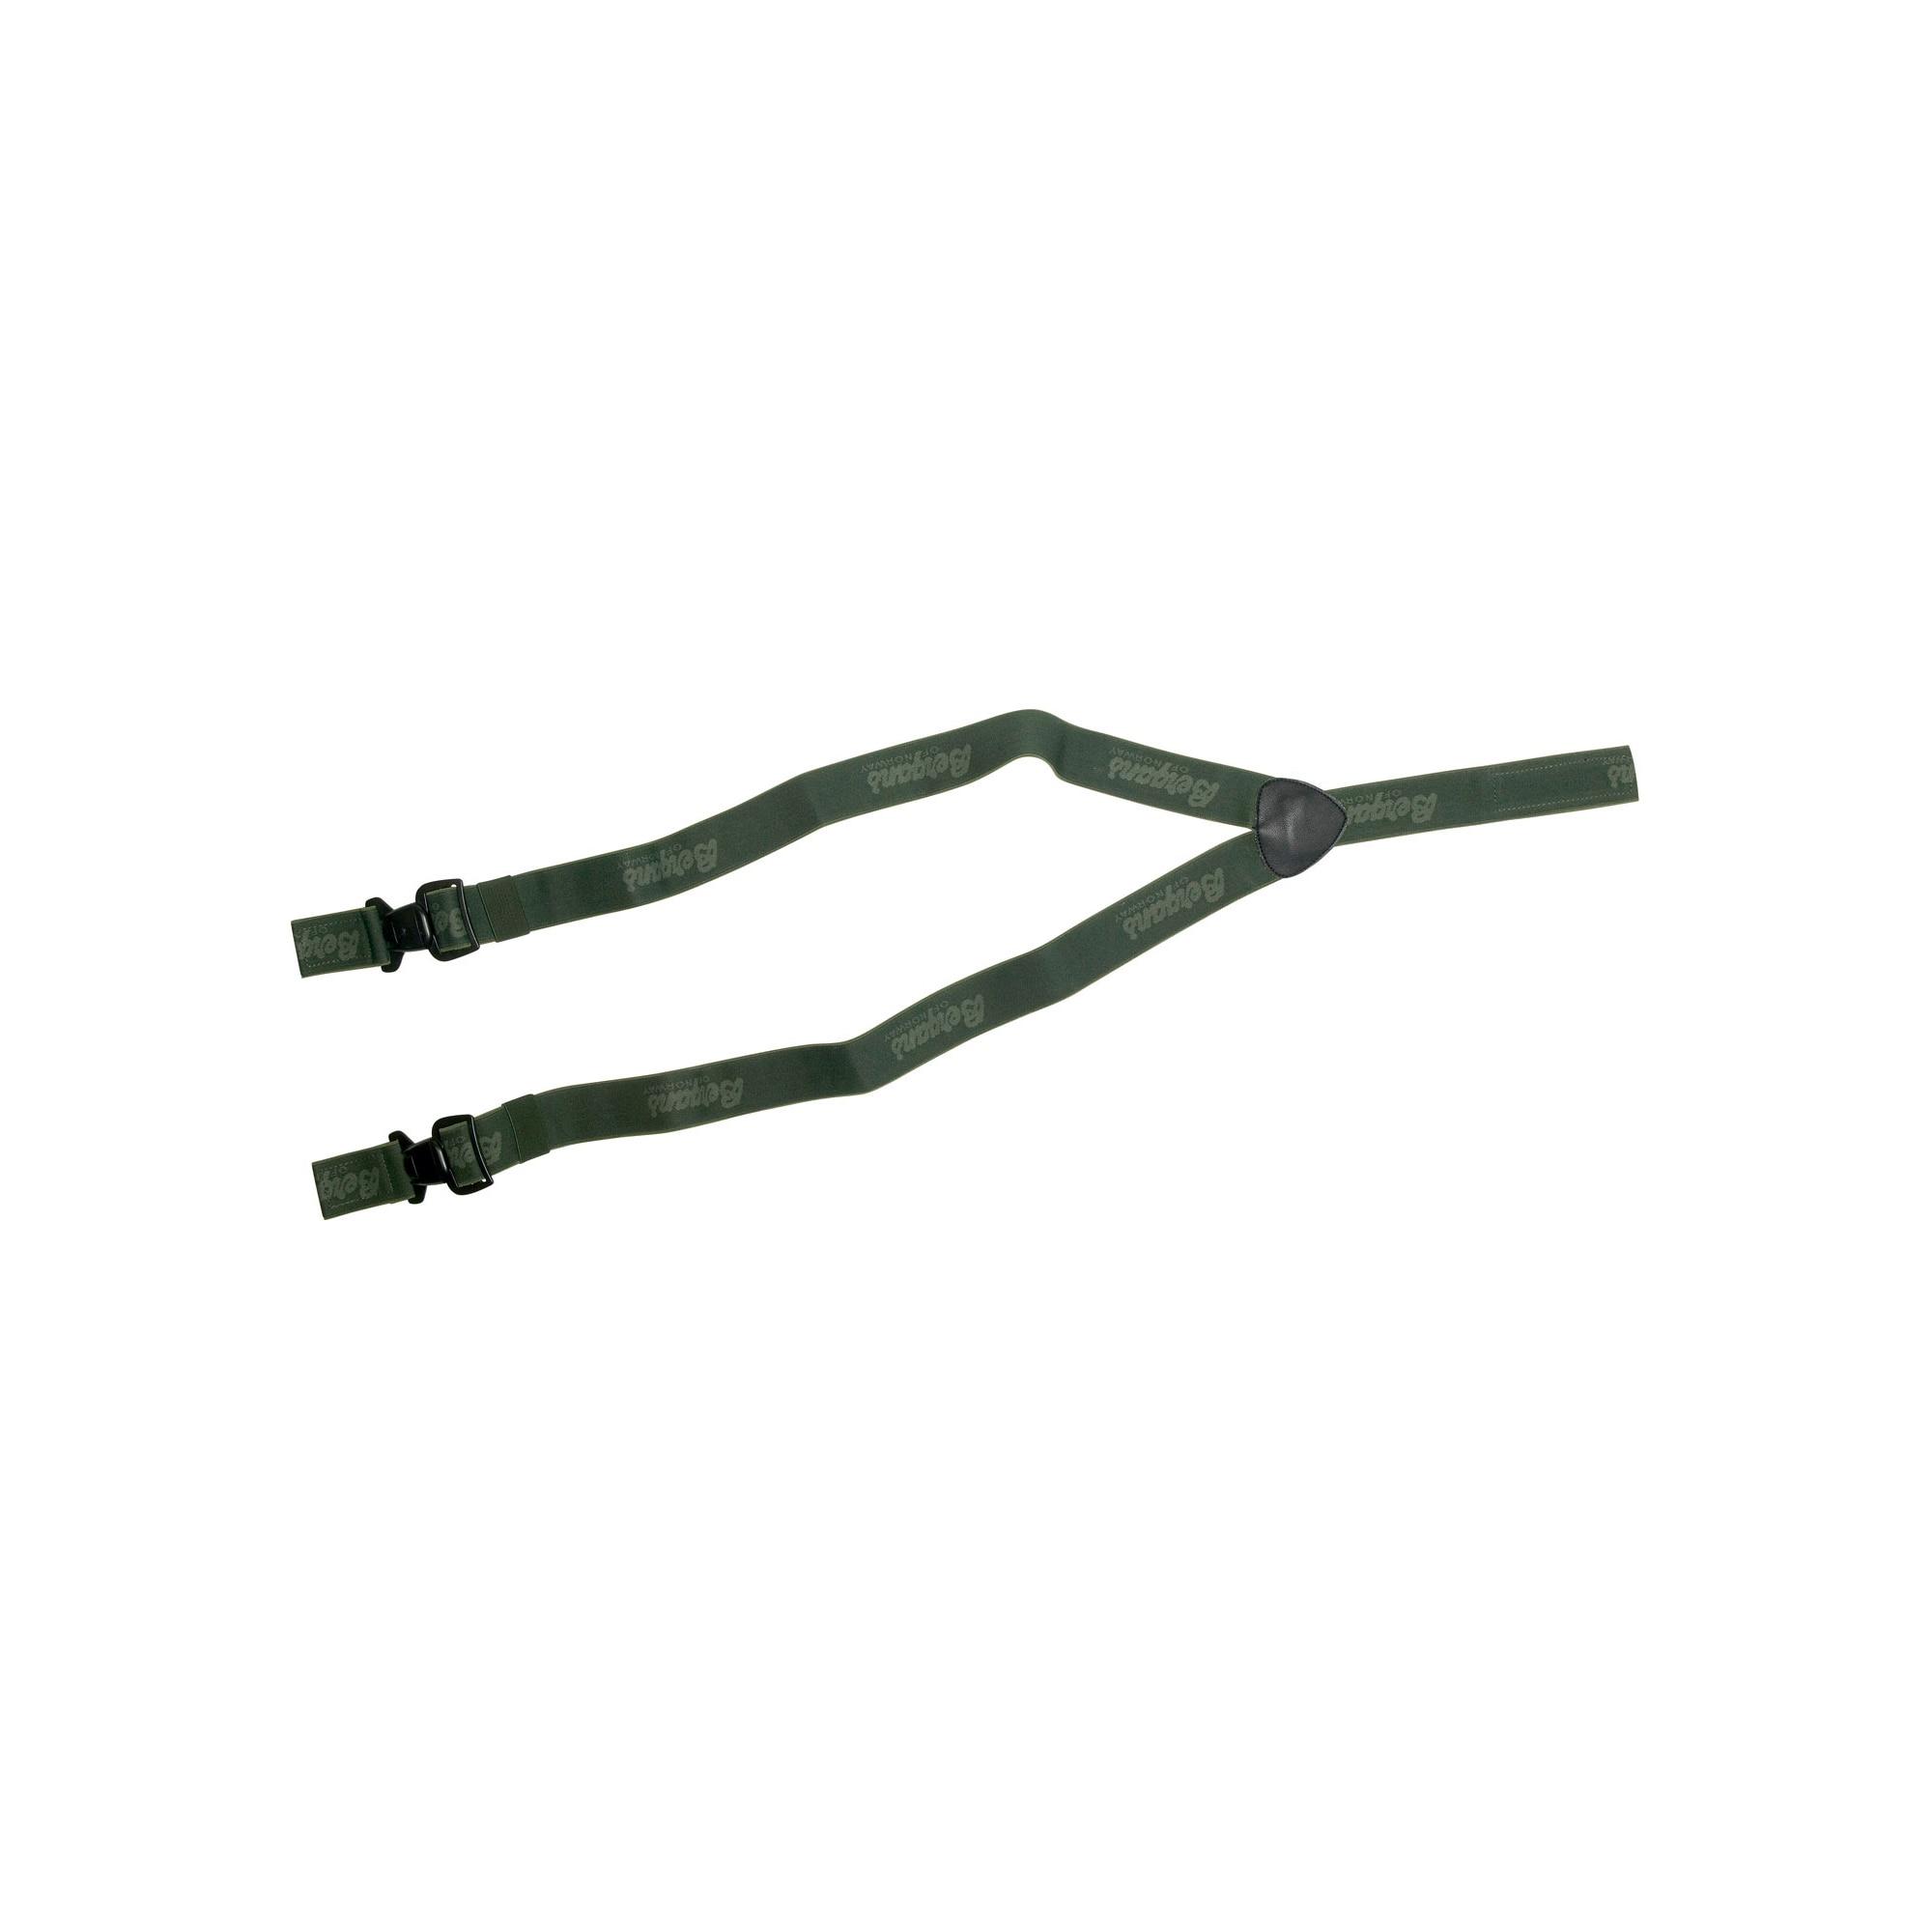 Suspenders Velcro